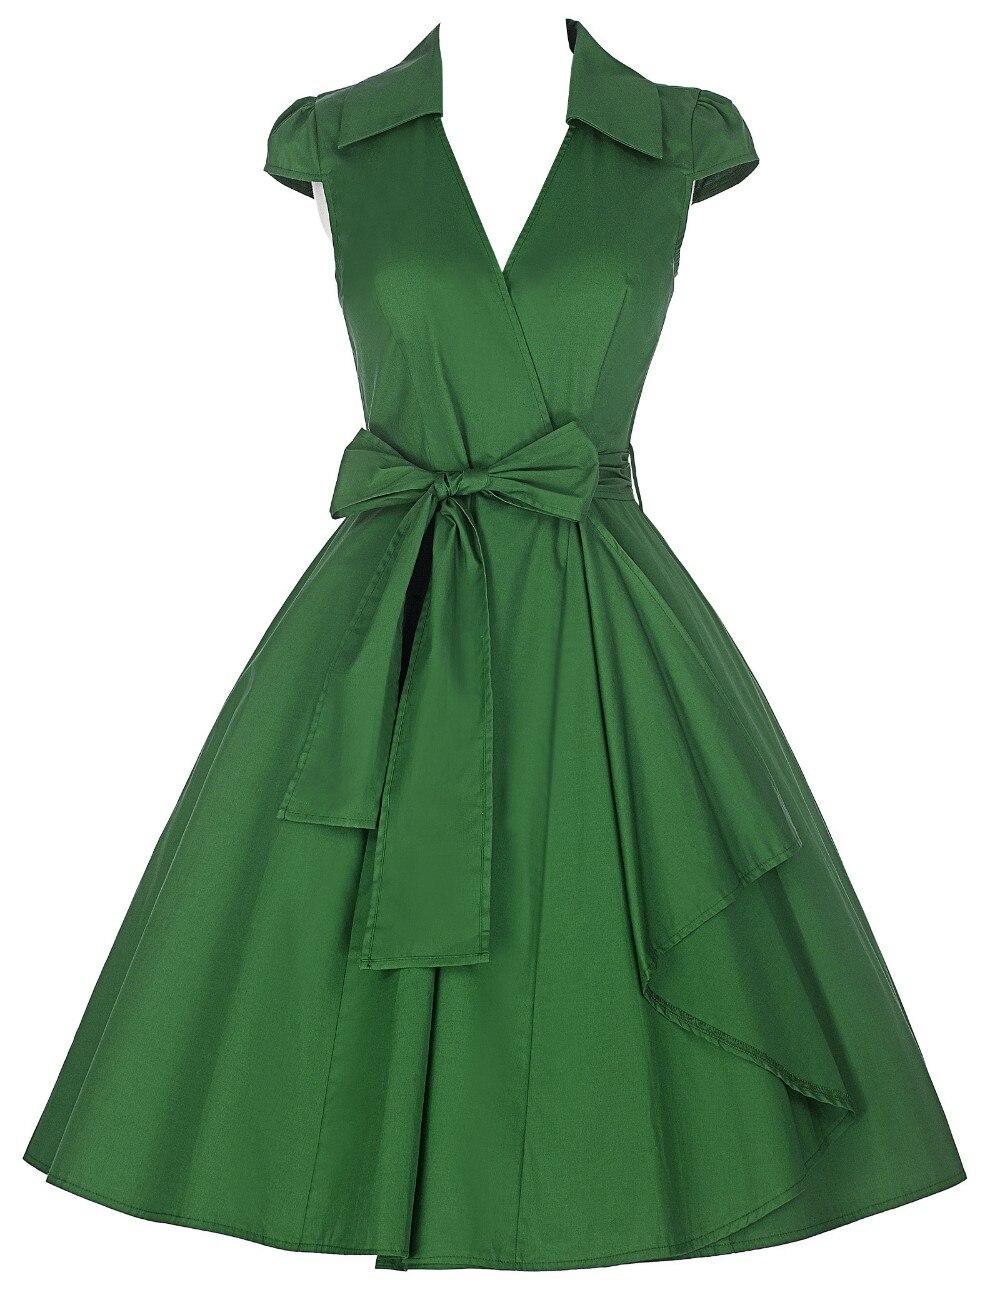 90fdb03a7f7 Women Summer Dress 2017 plus size clothing Audrey hepburn Floral robe Retro  Swing Casual 50s Vintage Rockabilly Dresses VestidosUSD 47.62 piece Belle  Poque ...